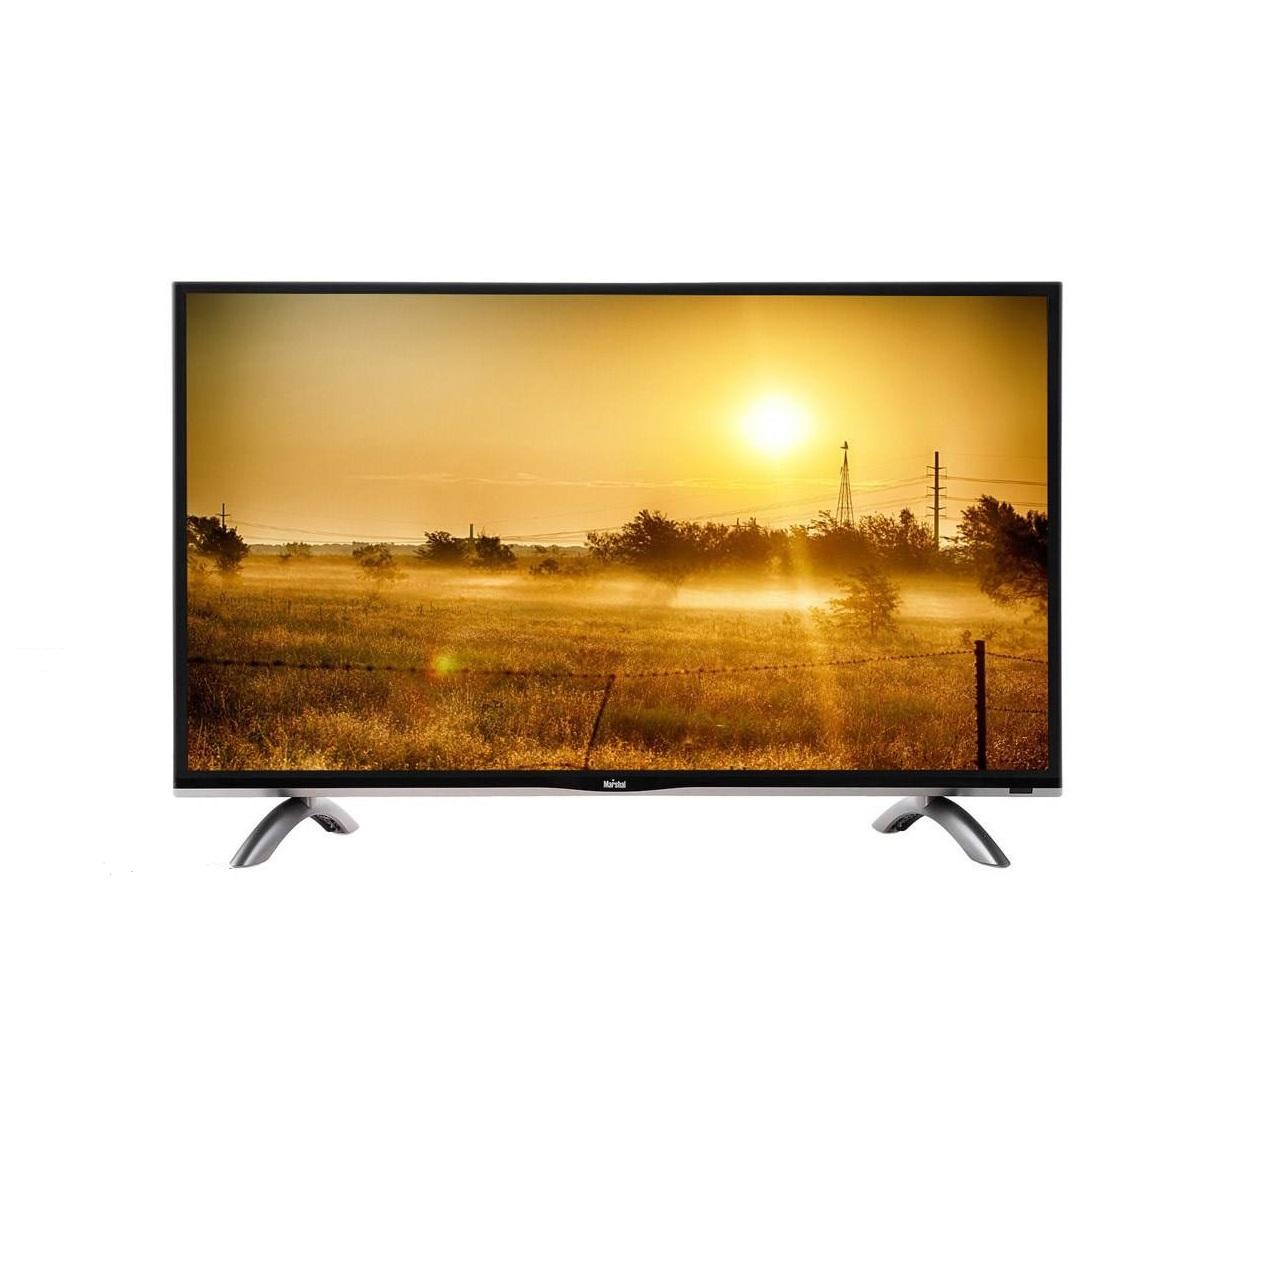 تلویزیون ال ای دی مدل ME-3240 سایز 32 اینچ